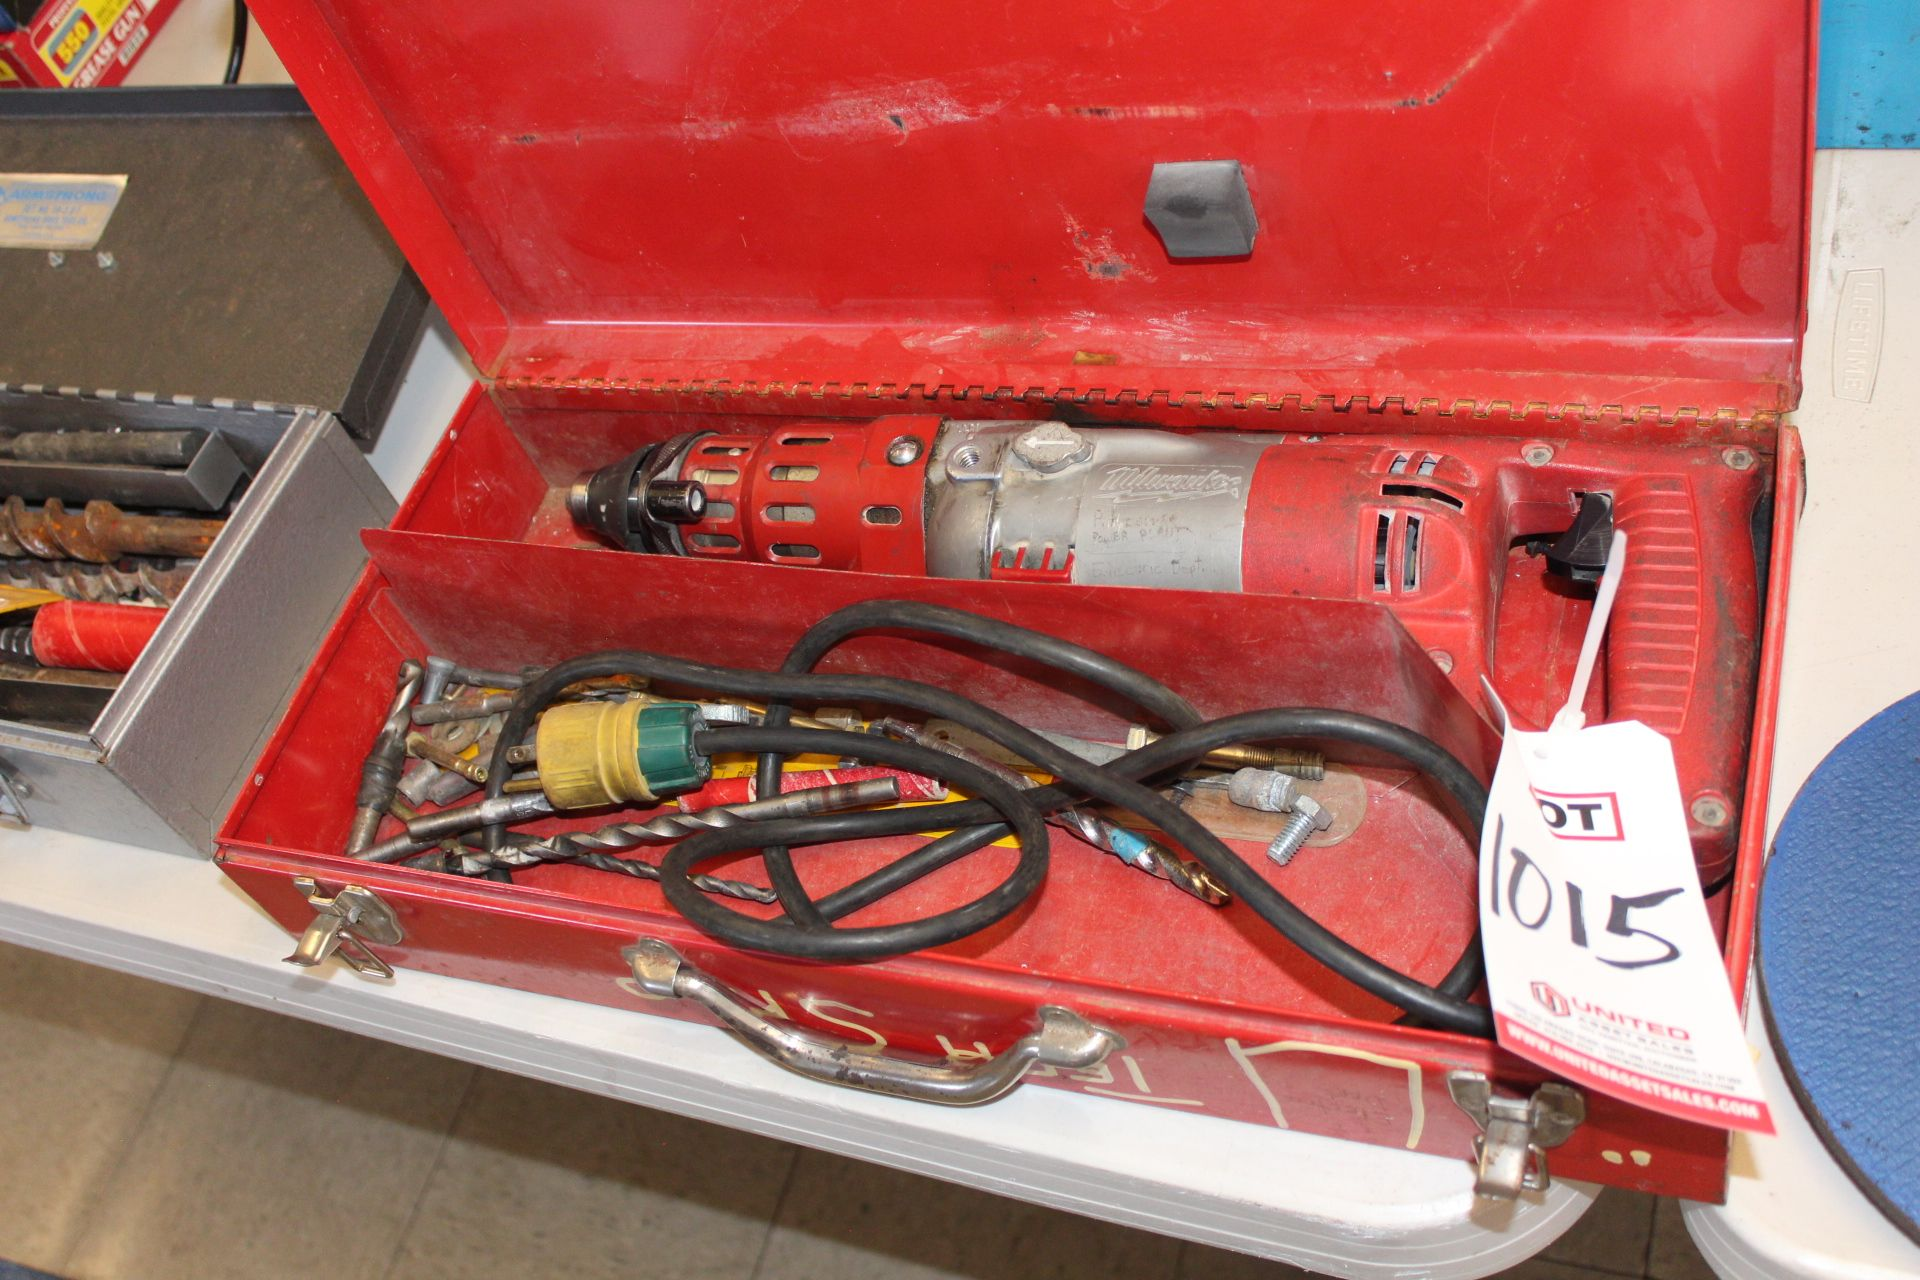 Lot 1015 - MILWAUKEE ROTARY HAMMER DRILL, (LUNCHROOM)